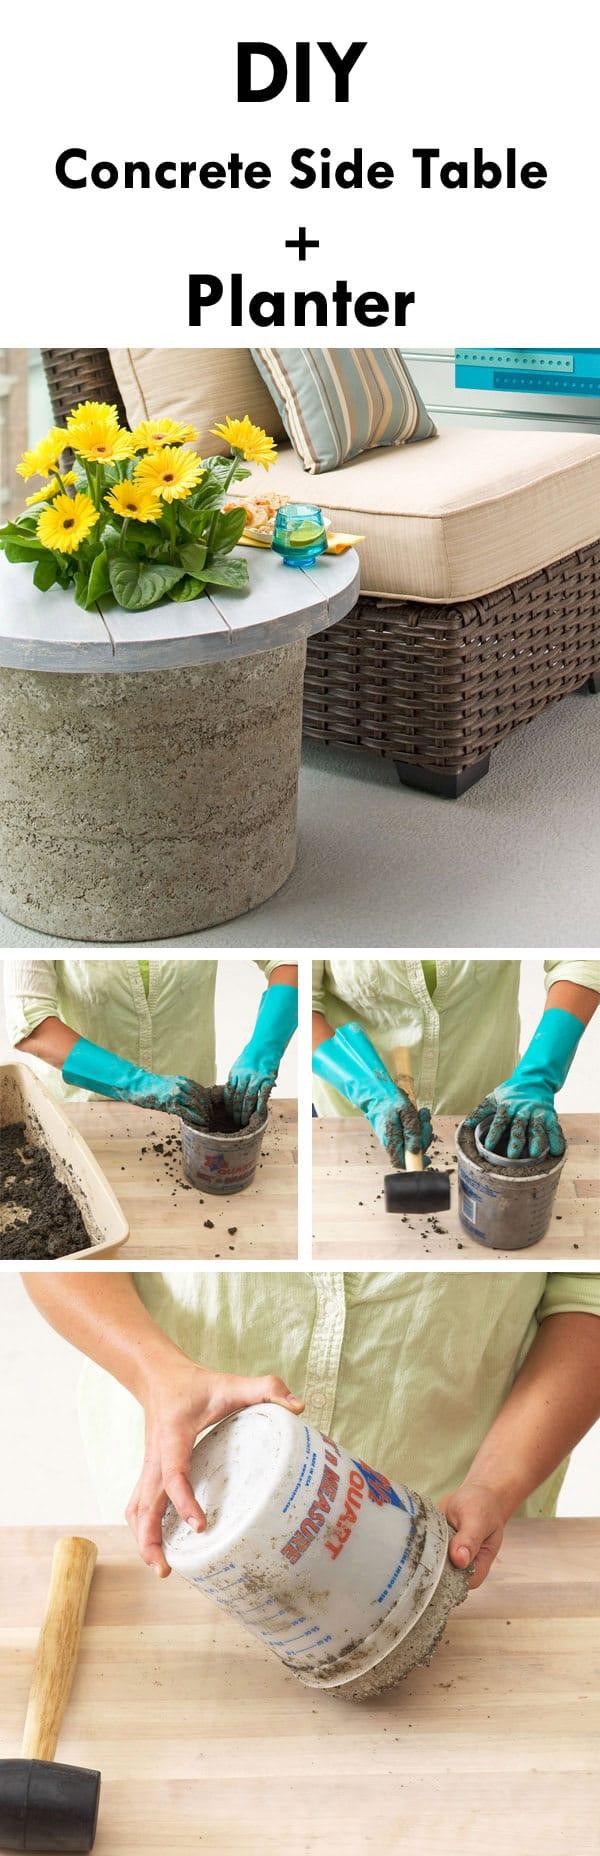 20 Amazing DIY Garden Furniture Ideas | DIY Patio ... - photo#15